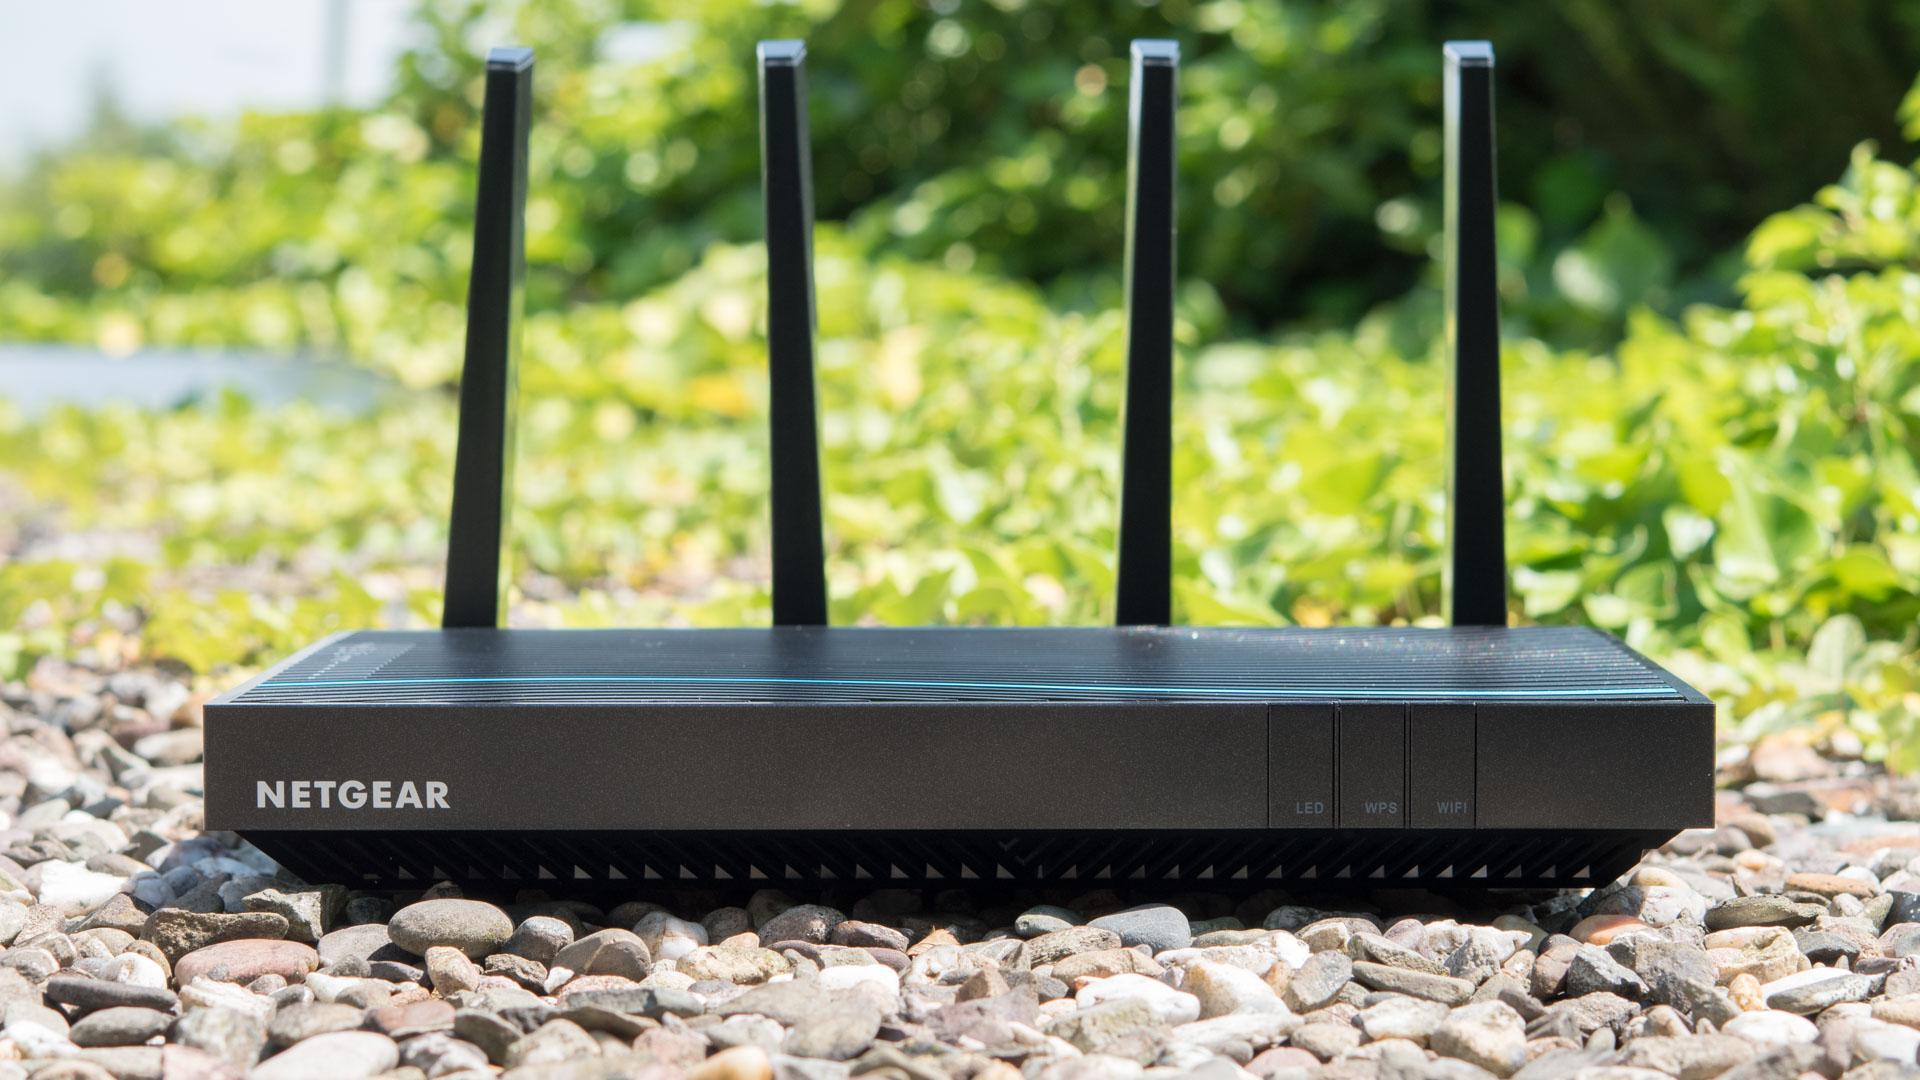 Die besten WLAN Router 2017, Bestenliste – Techtest